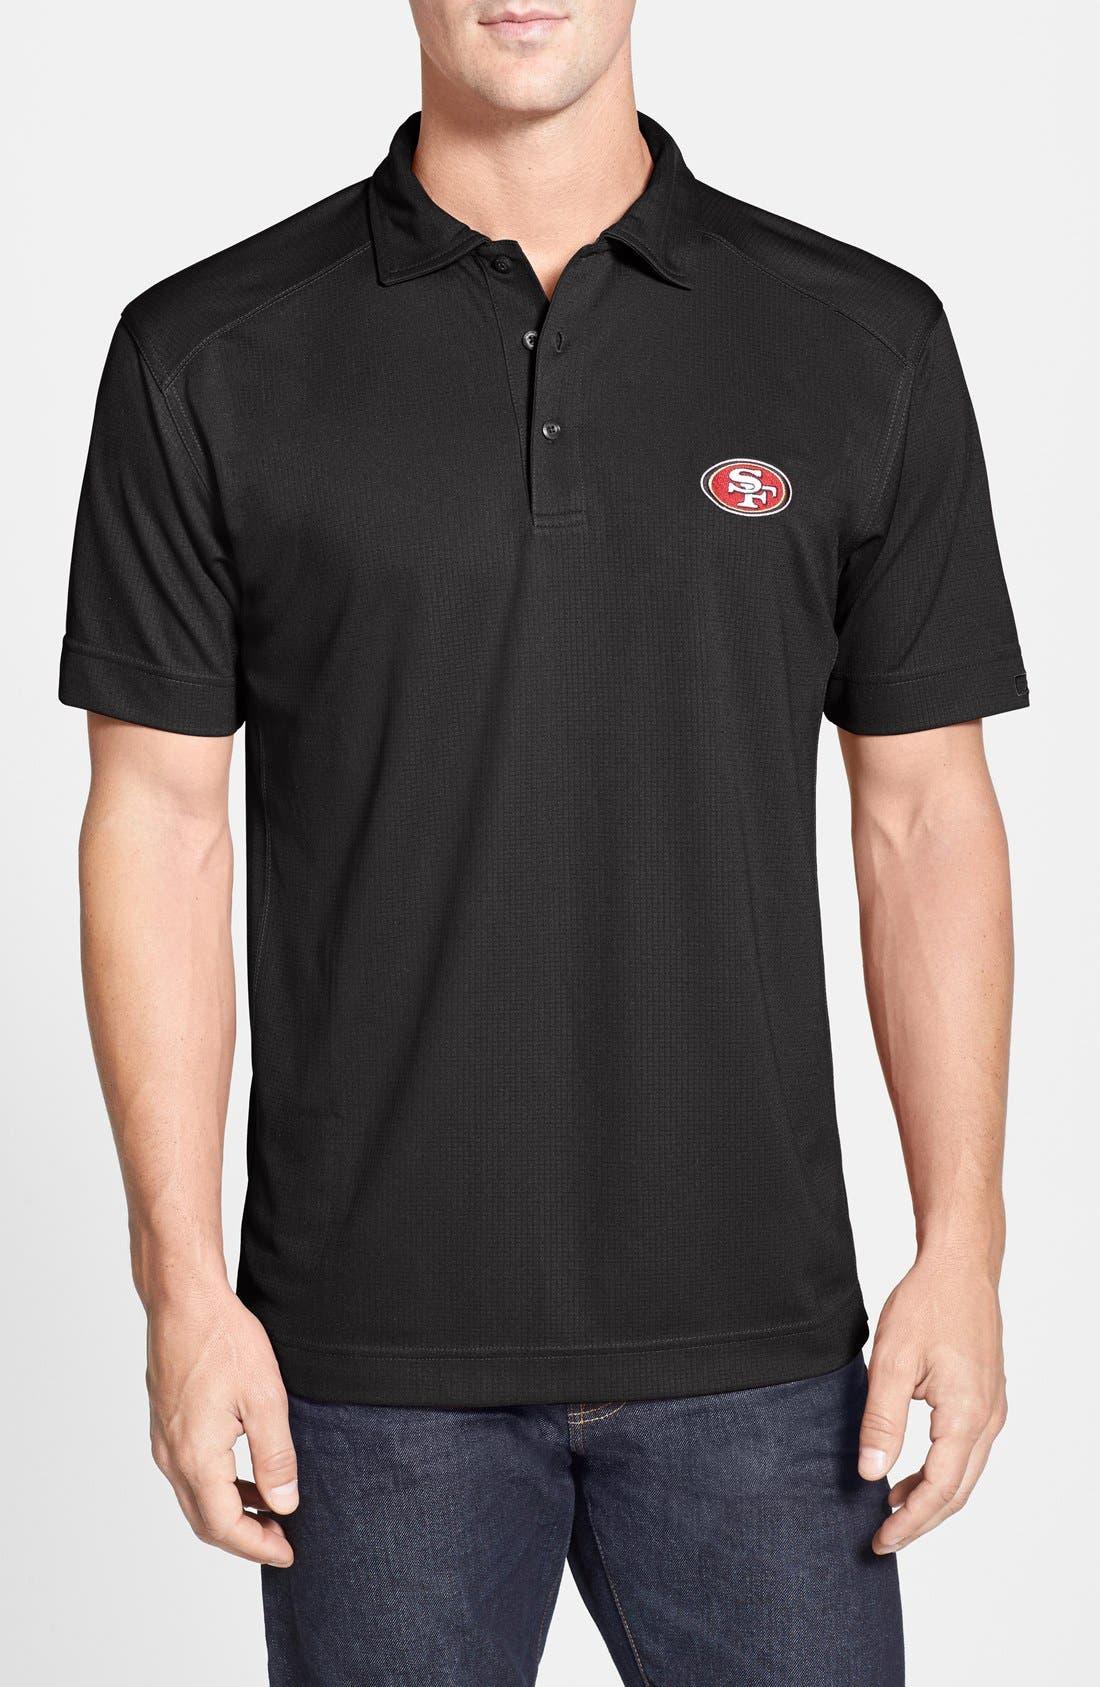 San Francisco 49ers - Genre DryTec Moisture Wicking Polo,                             Main thumbnail 1, color,                             001